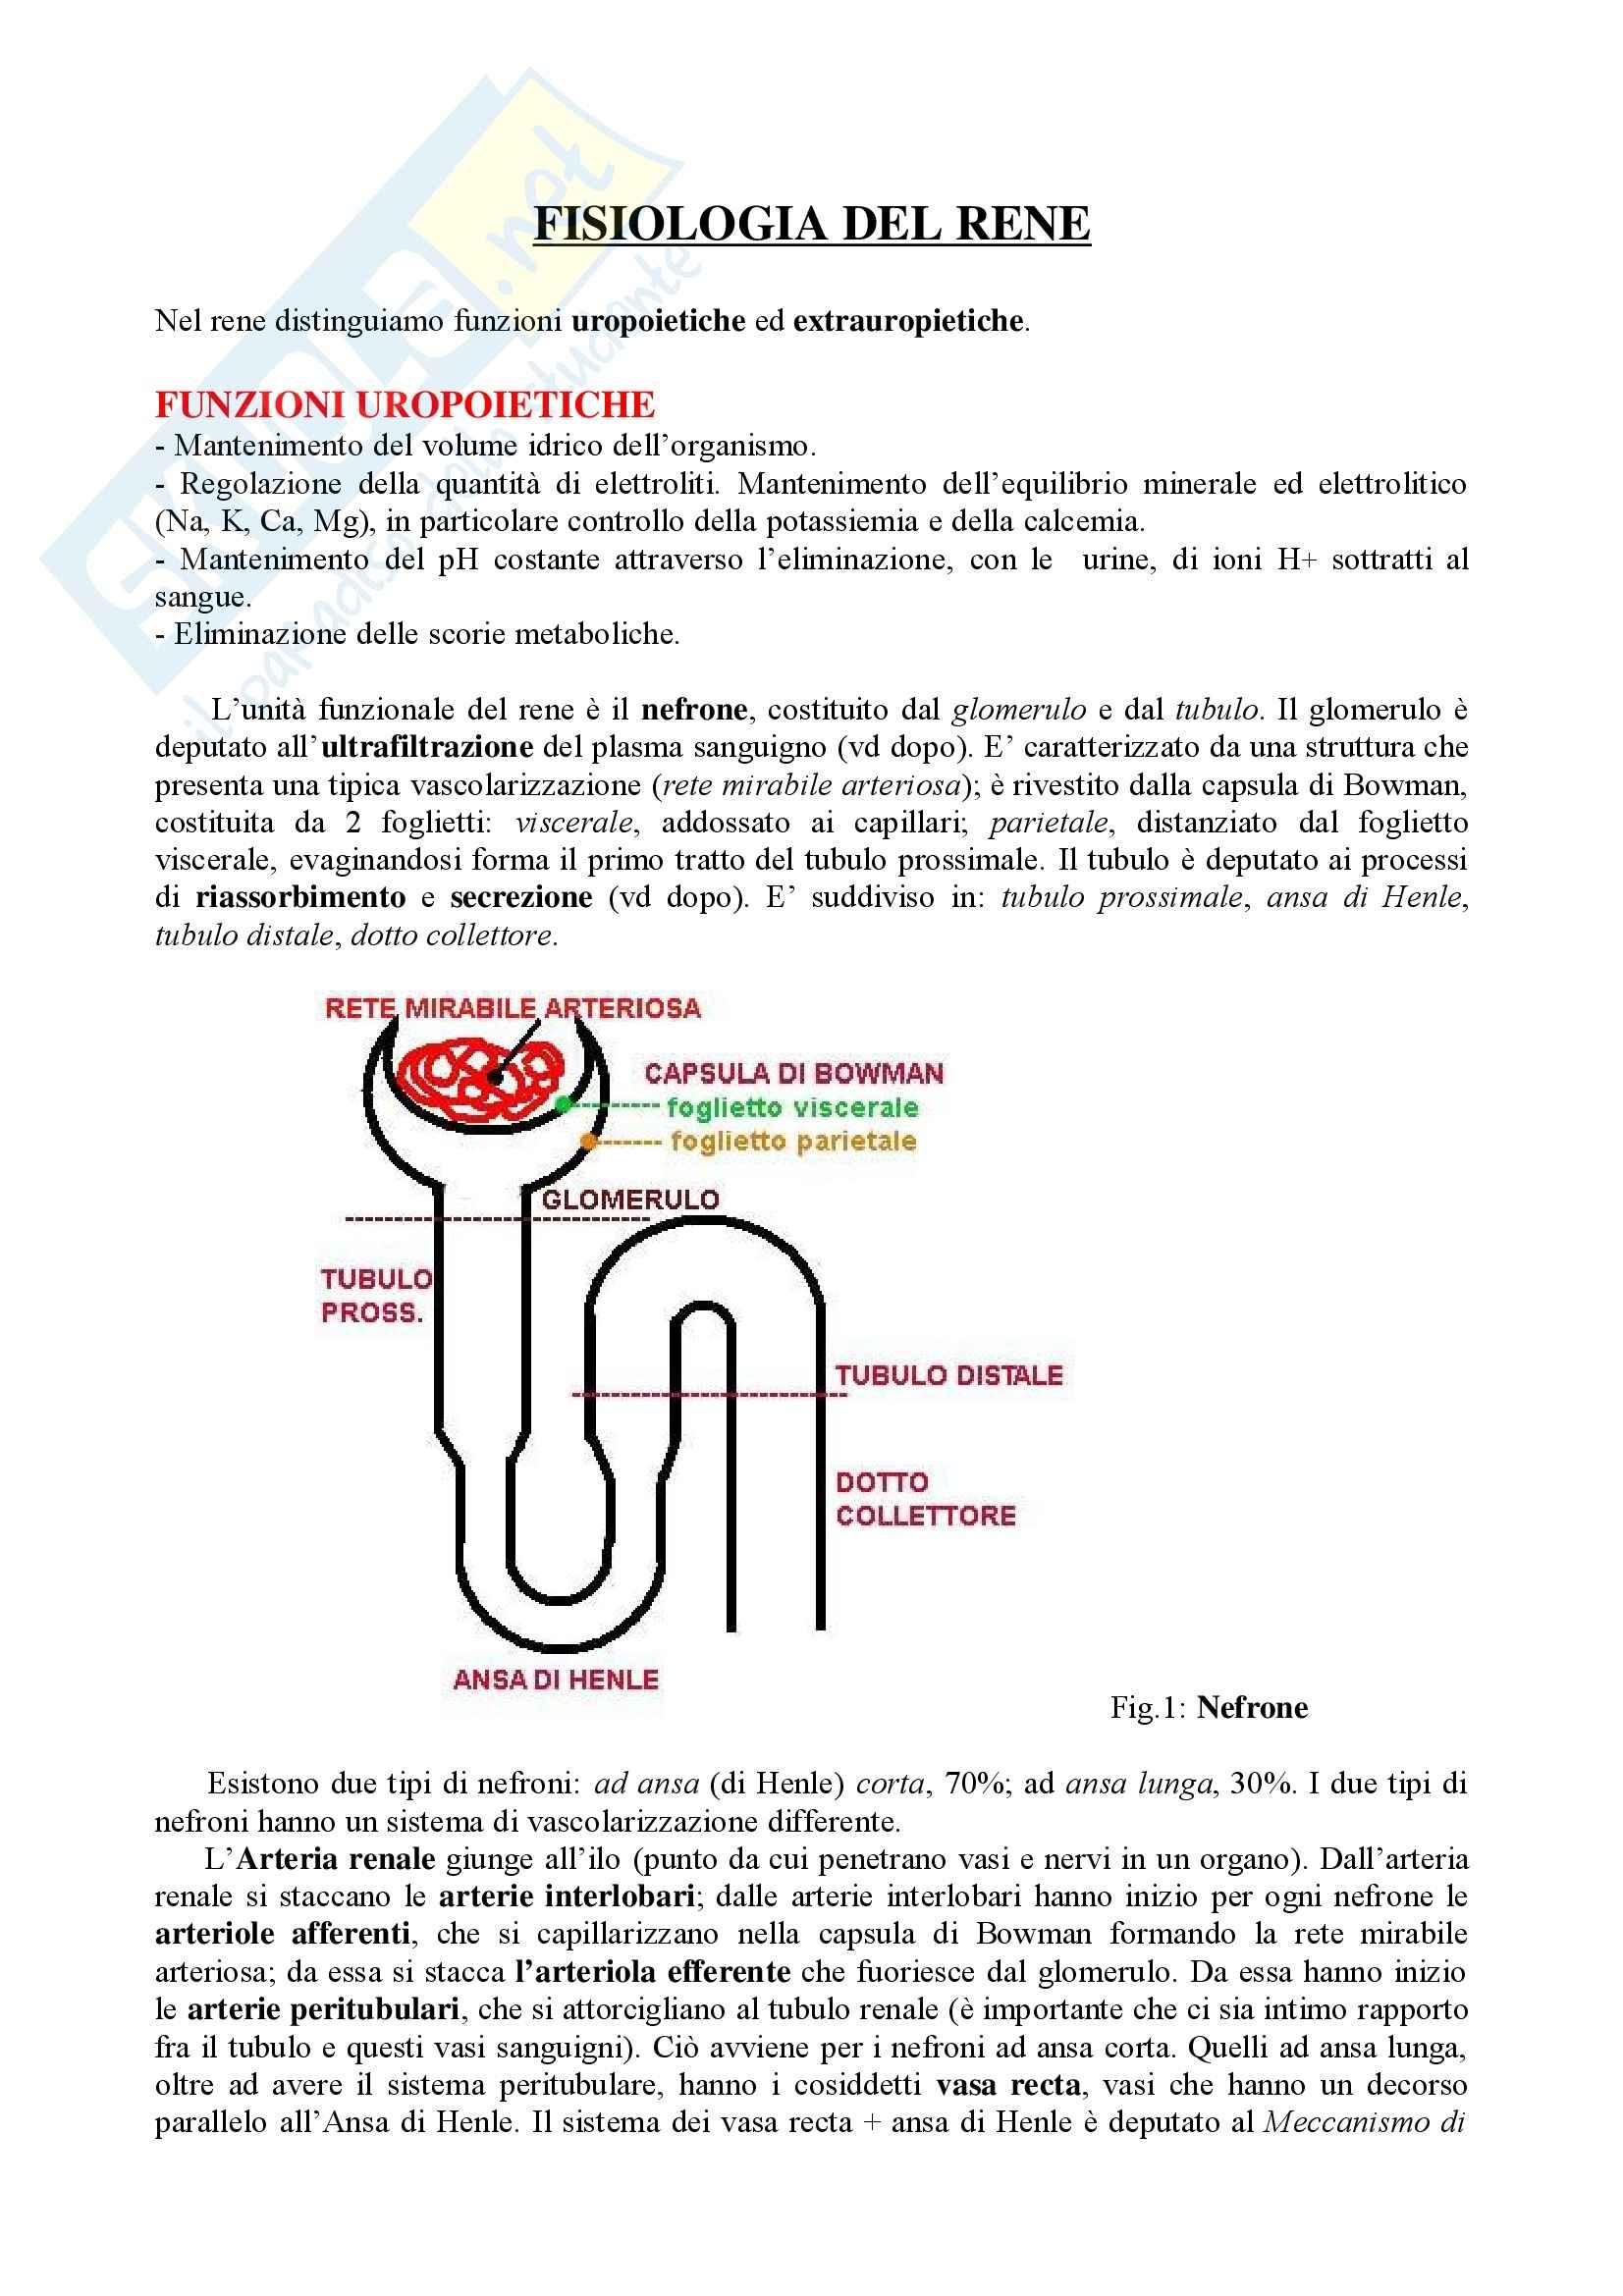 Fisiologia – Fisiologia del Rene